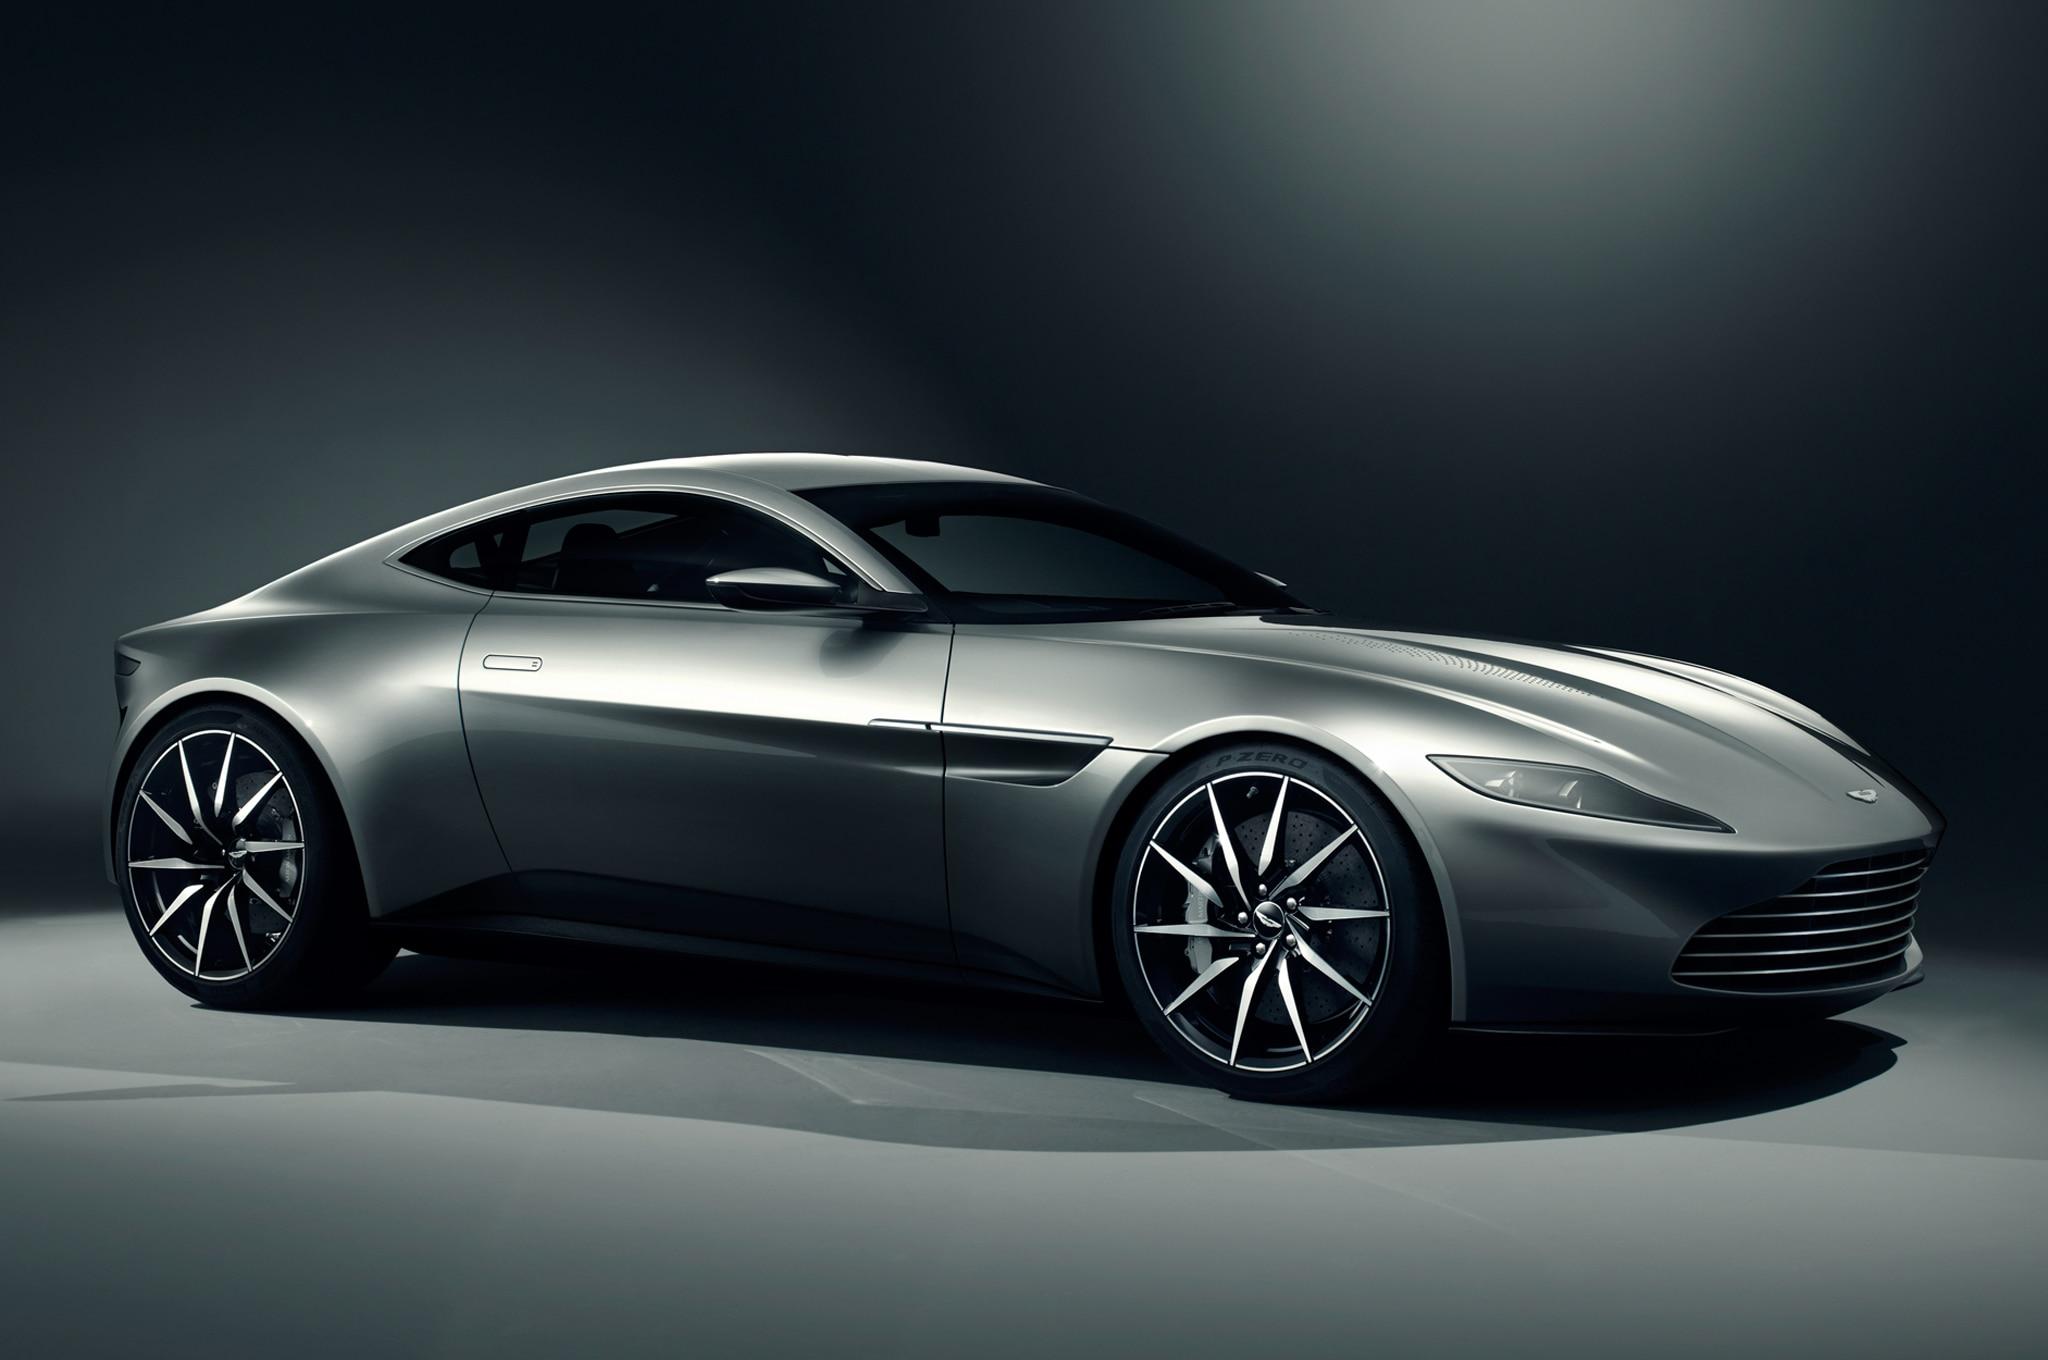 Aston Martin Db10 James Bond Car Spectre